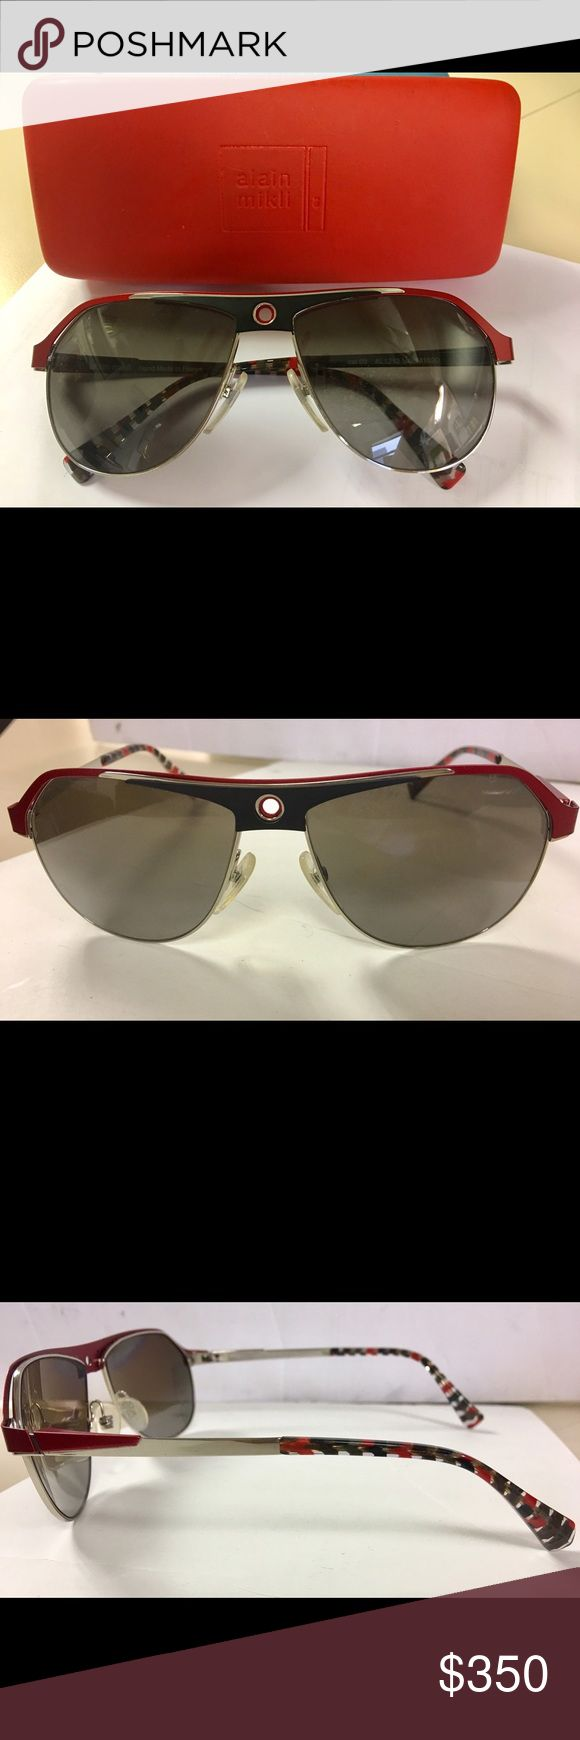 Alain Mikli Sunglasses Modern aviators. Titanium metal frame. Worn 3 times. Comes with original case and lens cloth. alain mikli Other